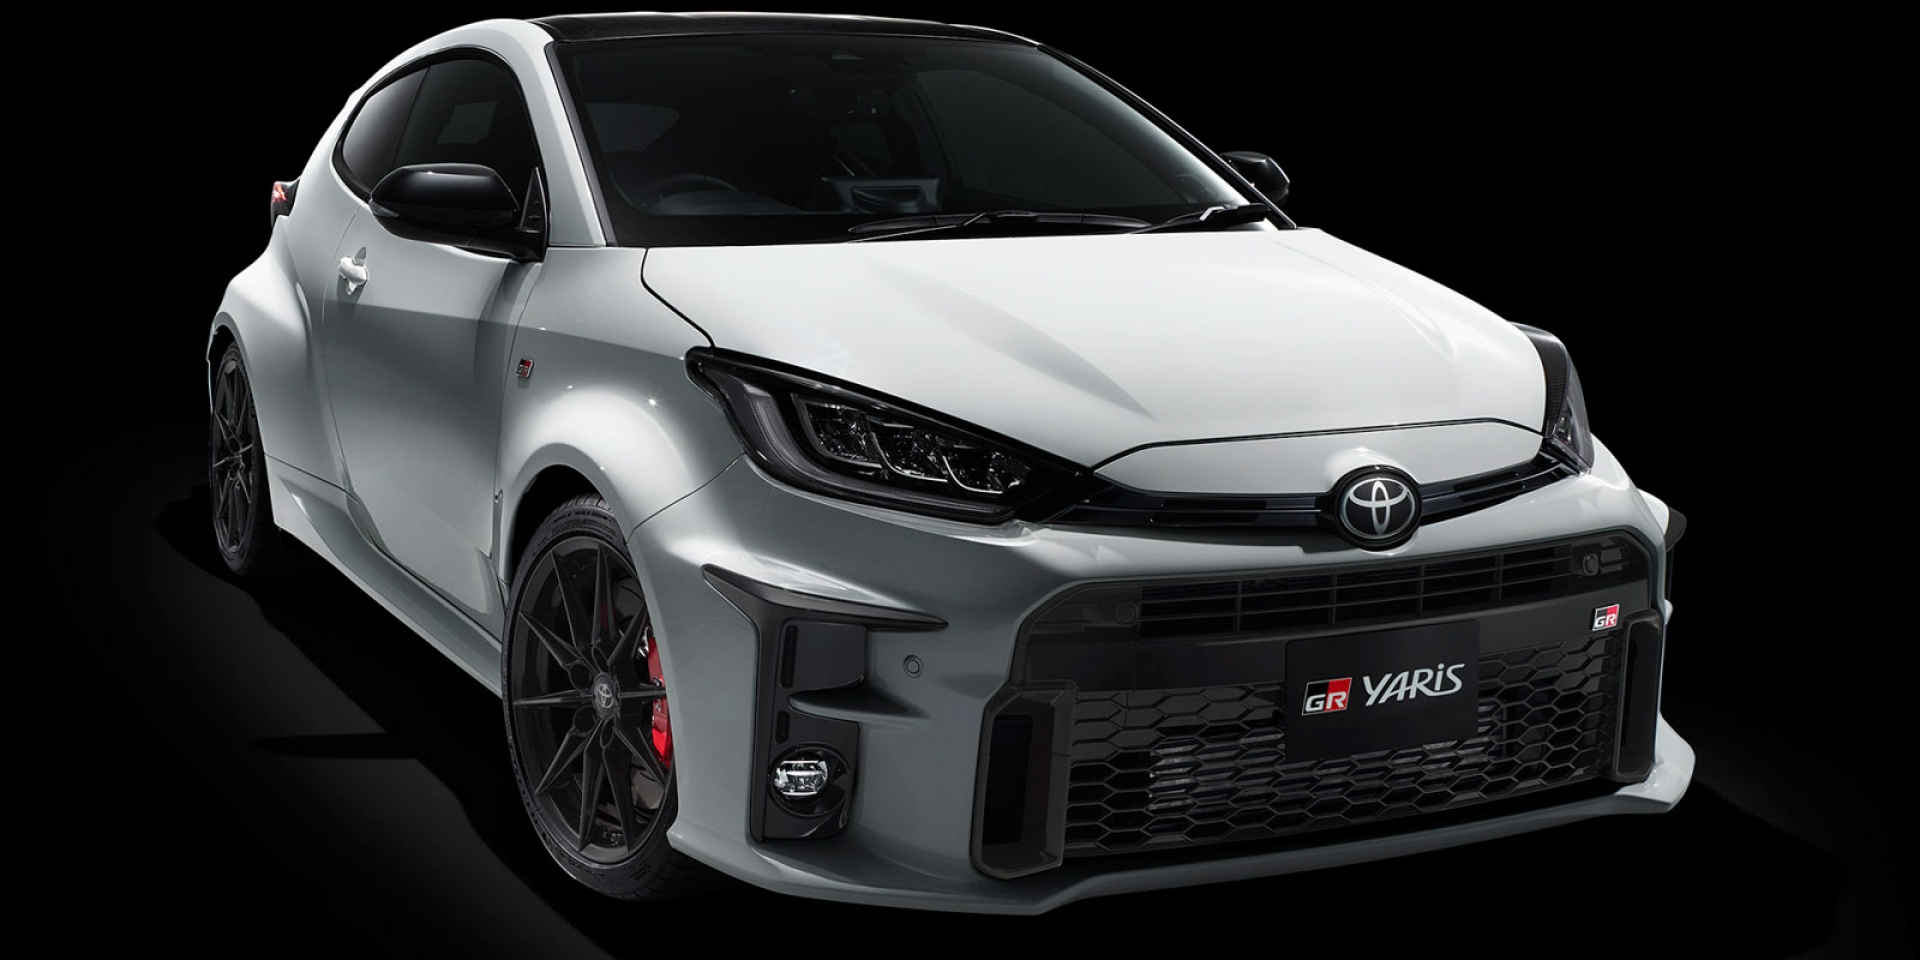 272PS暴力Yaris,Toyota GR Yaris東京改裝車展登場